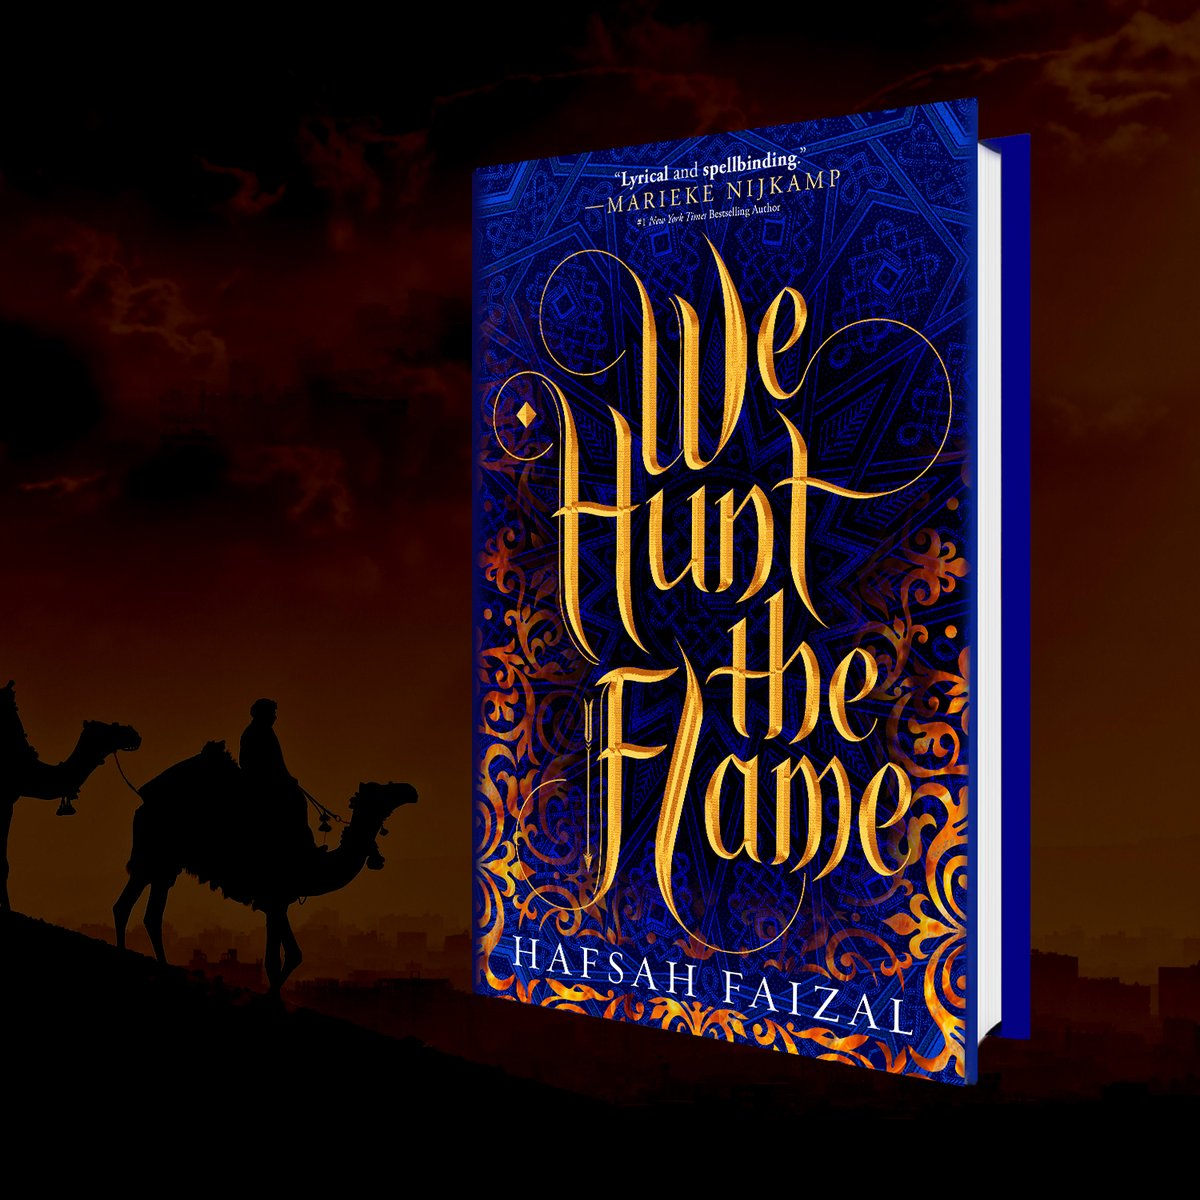 https://www.hafsahfaizal.com/books/we-hunt-the-flame